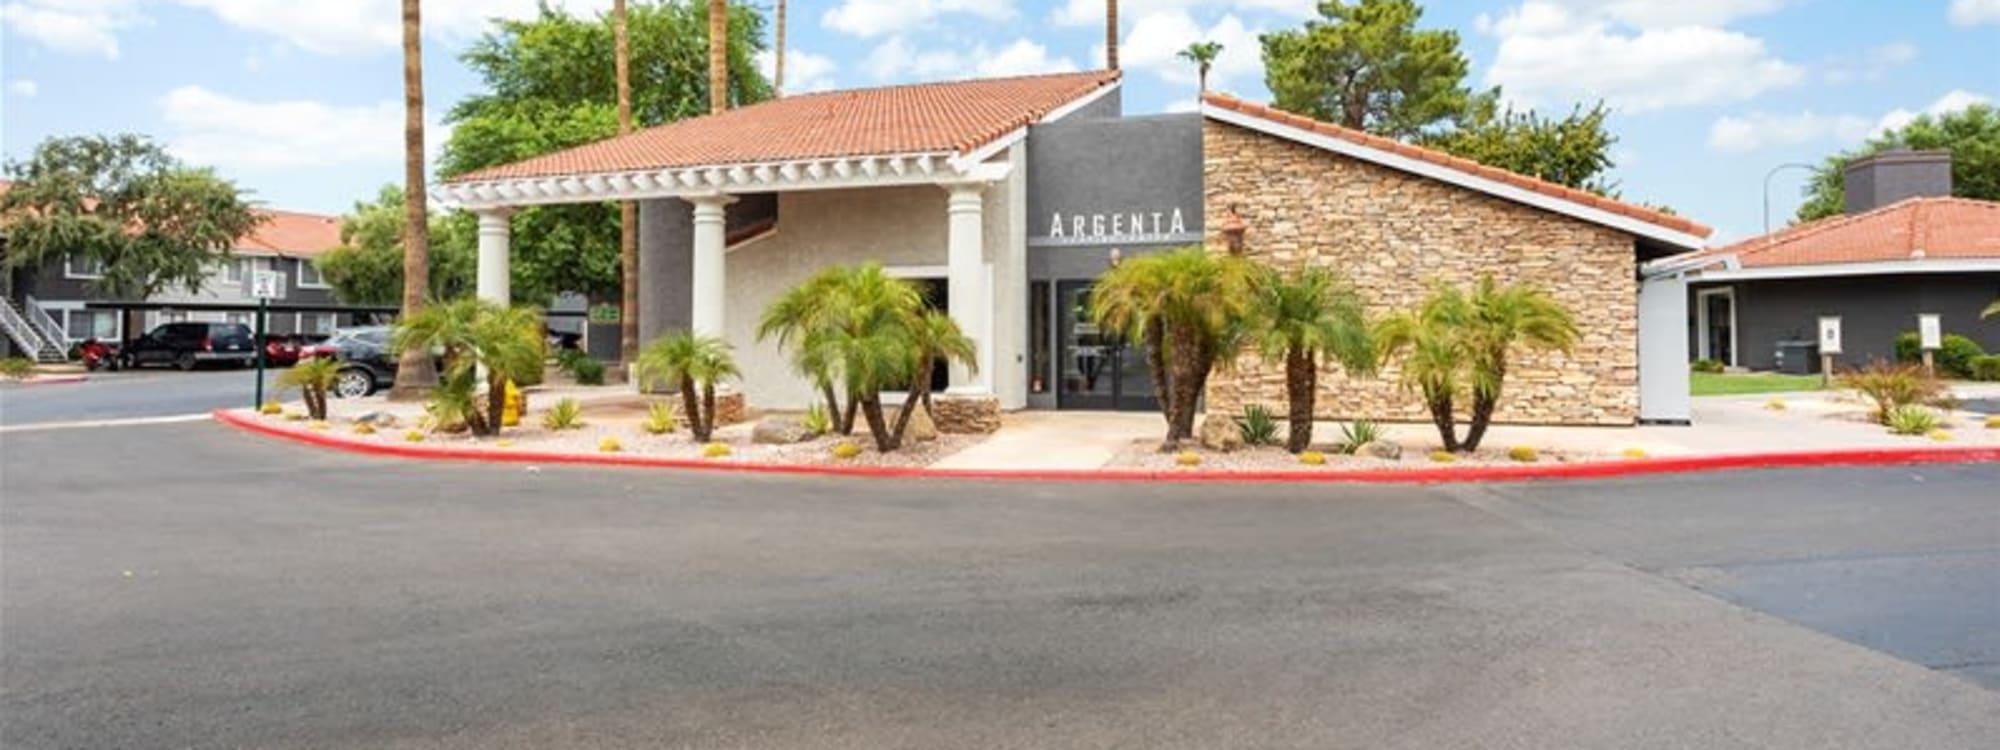 Neighborhood near Argenta Apartments in Mesa, Arizona